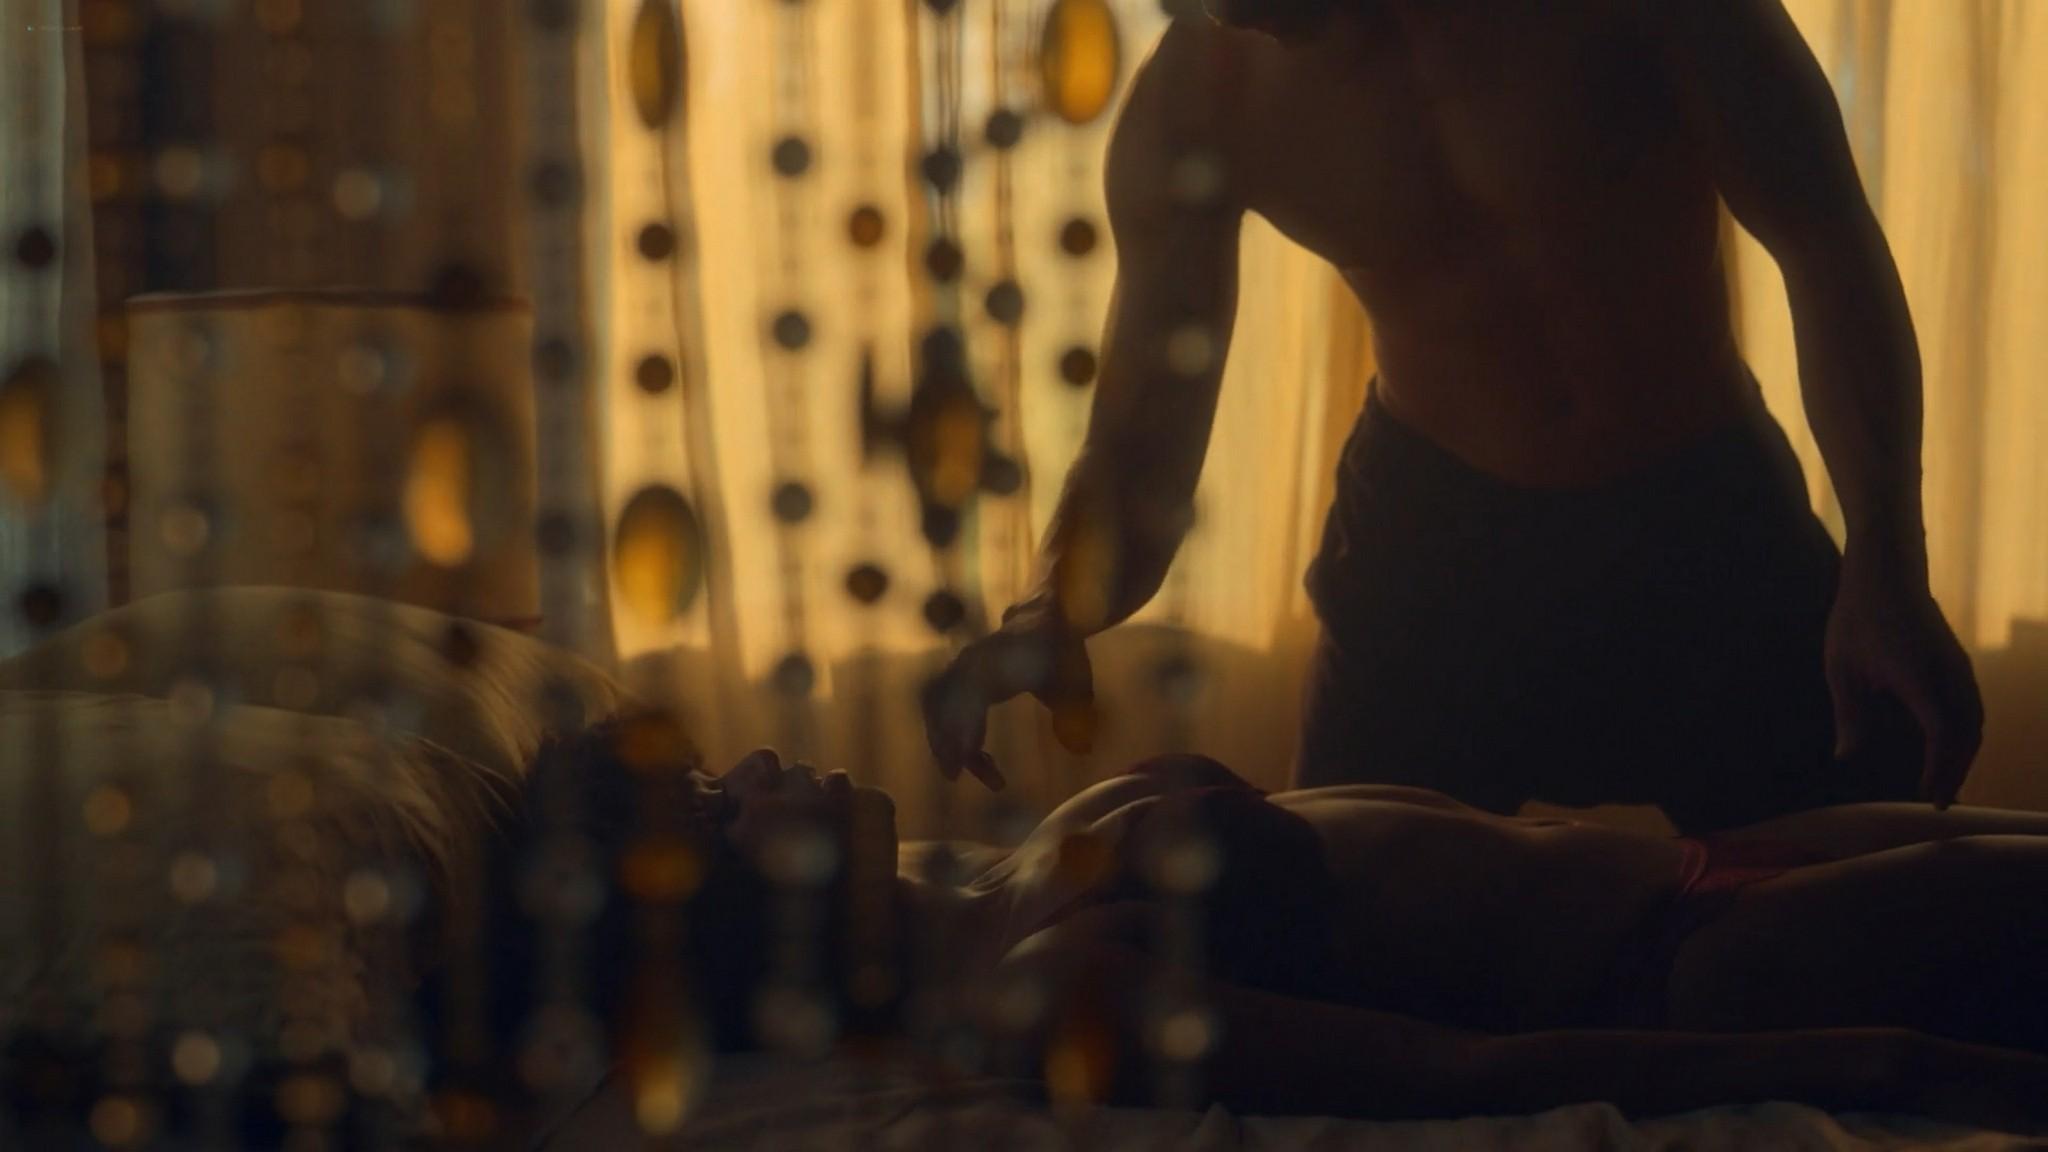 Samara Weaving hot sex Nicole Kidman and others sexy Nine Perfect Strangers 2021 s1e5 1080p 10